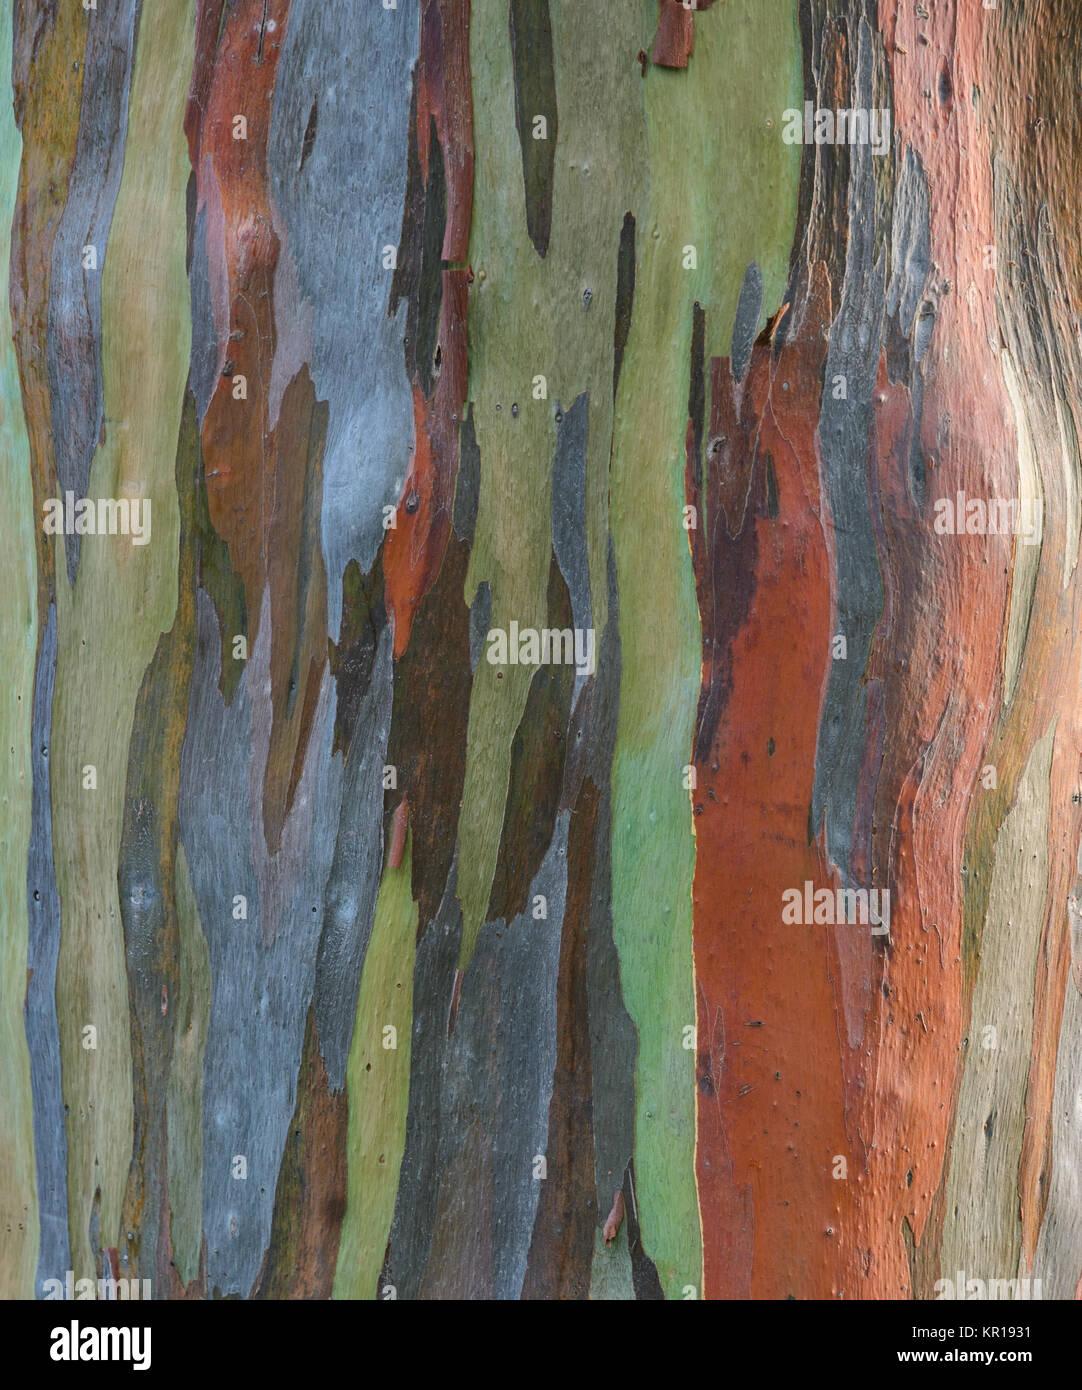 Eucalyptus deglupta tree bark texture - Stock Image